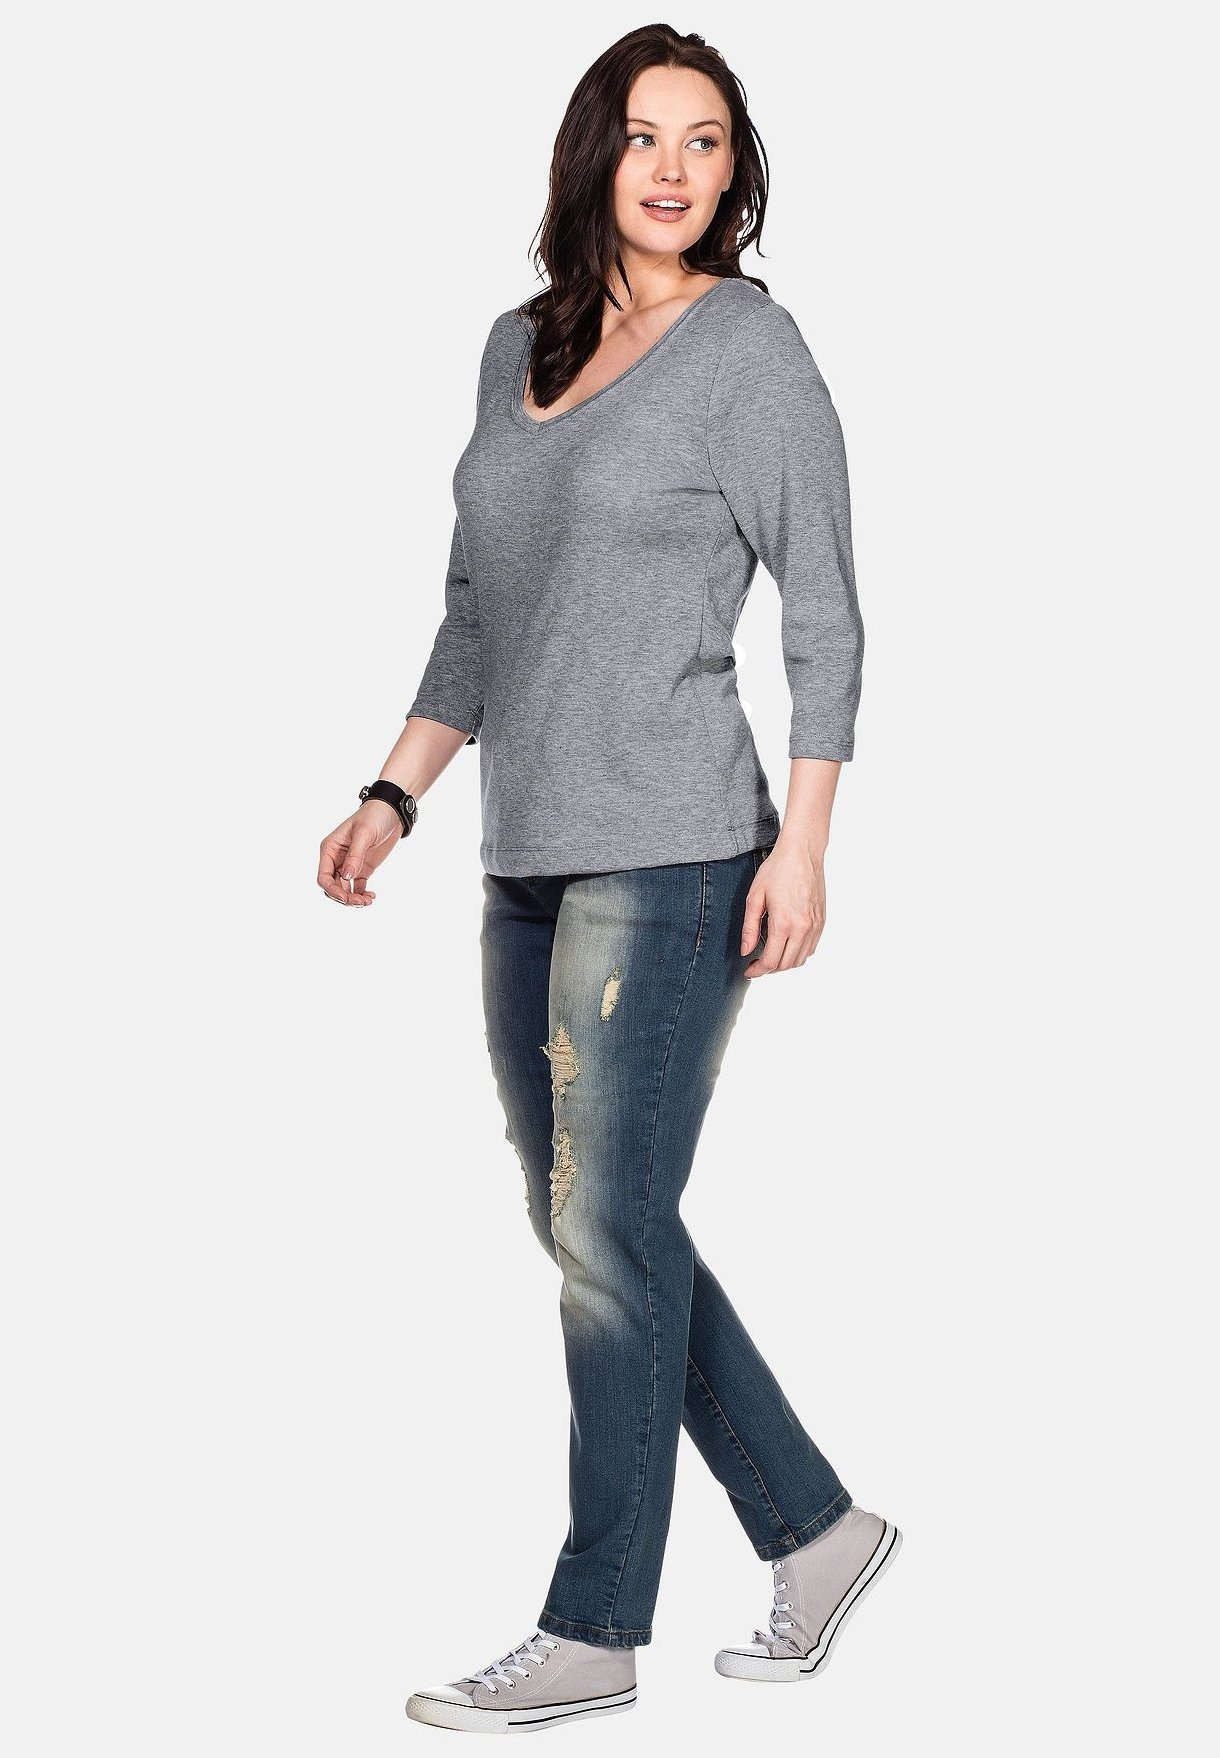 Sheego Long Sleeved Top - Grey